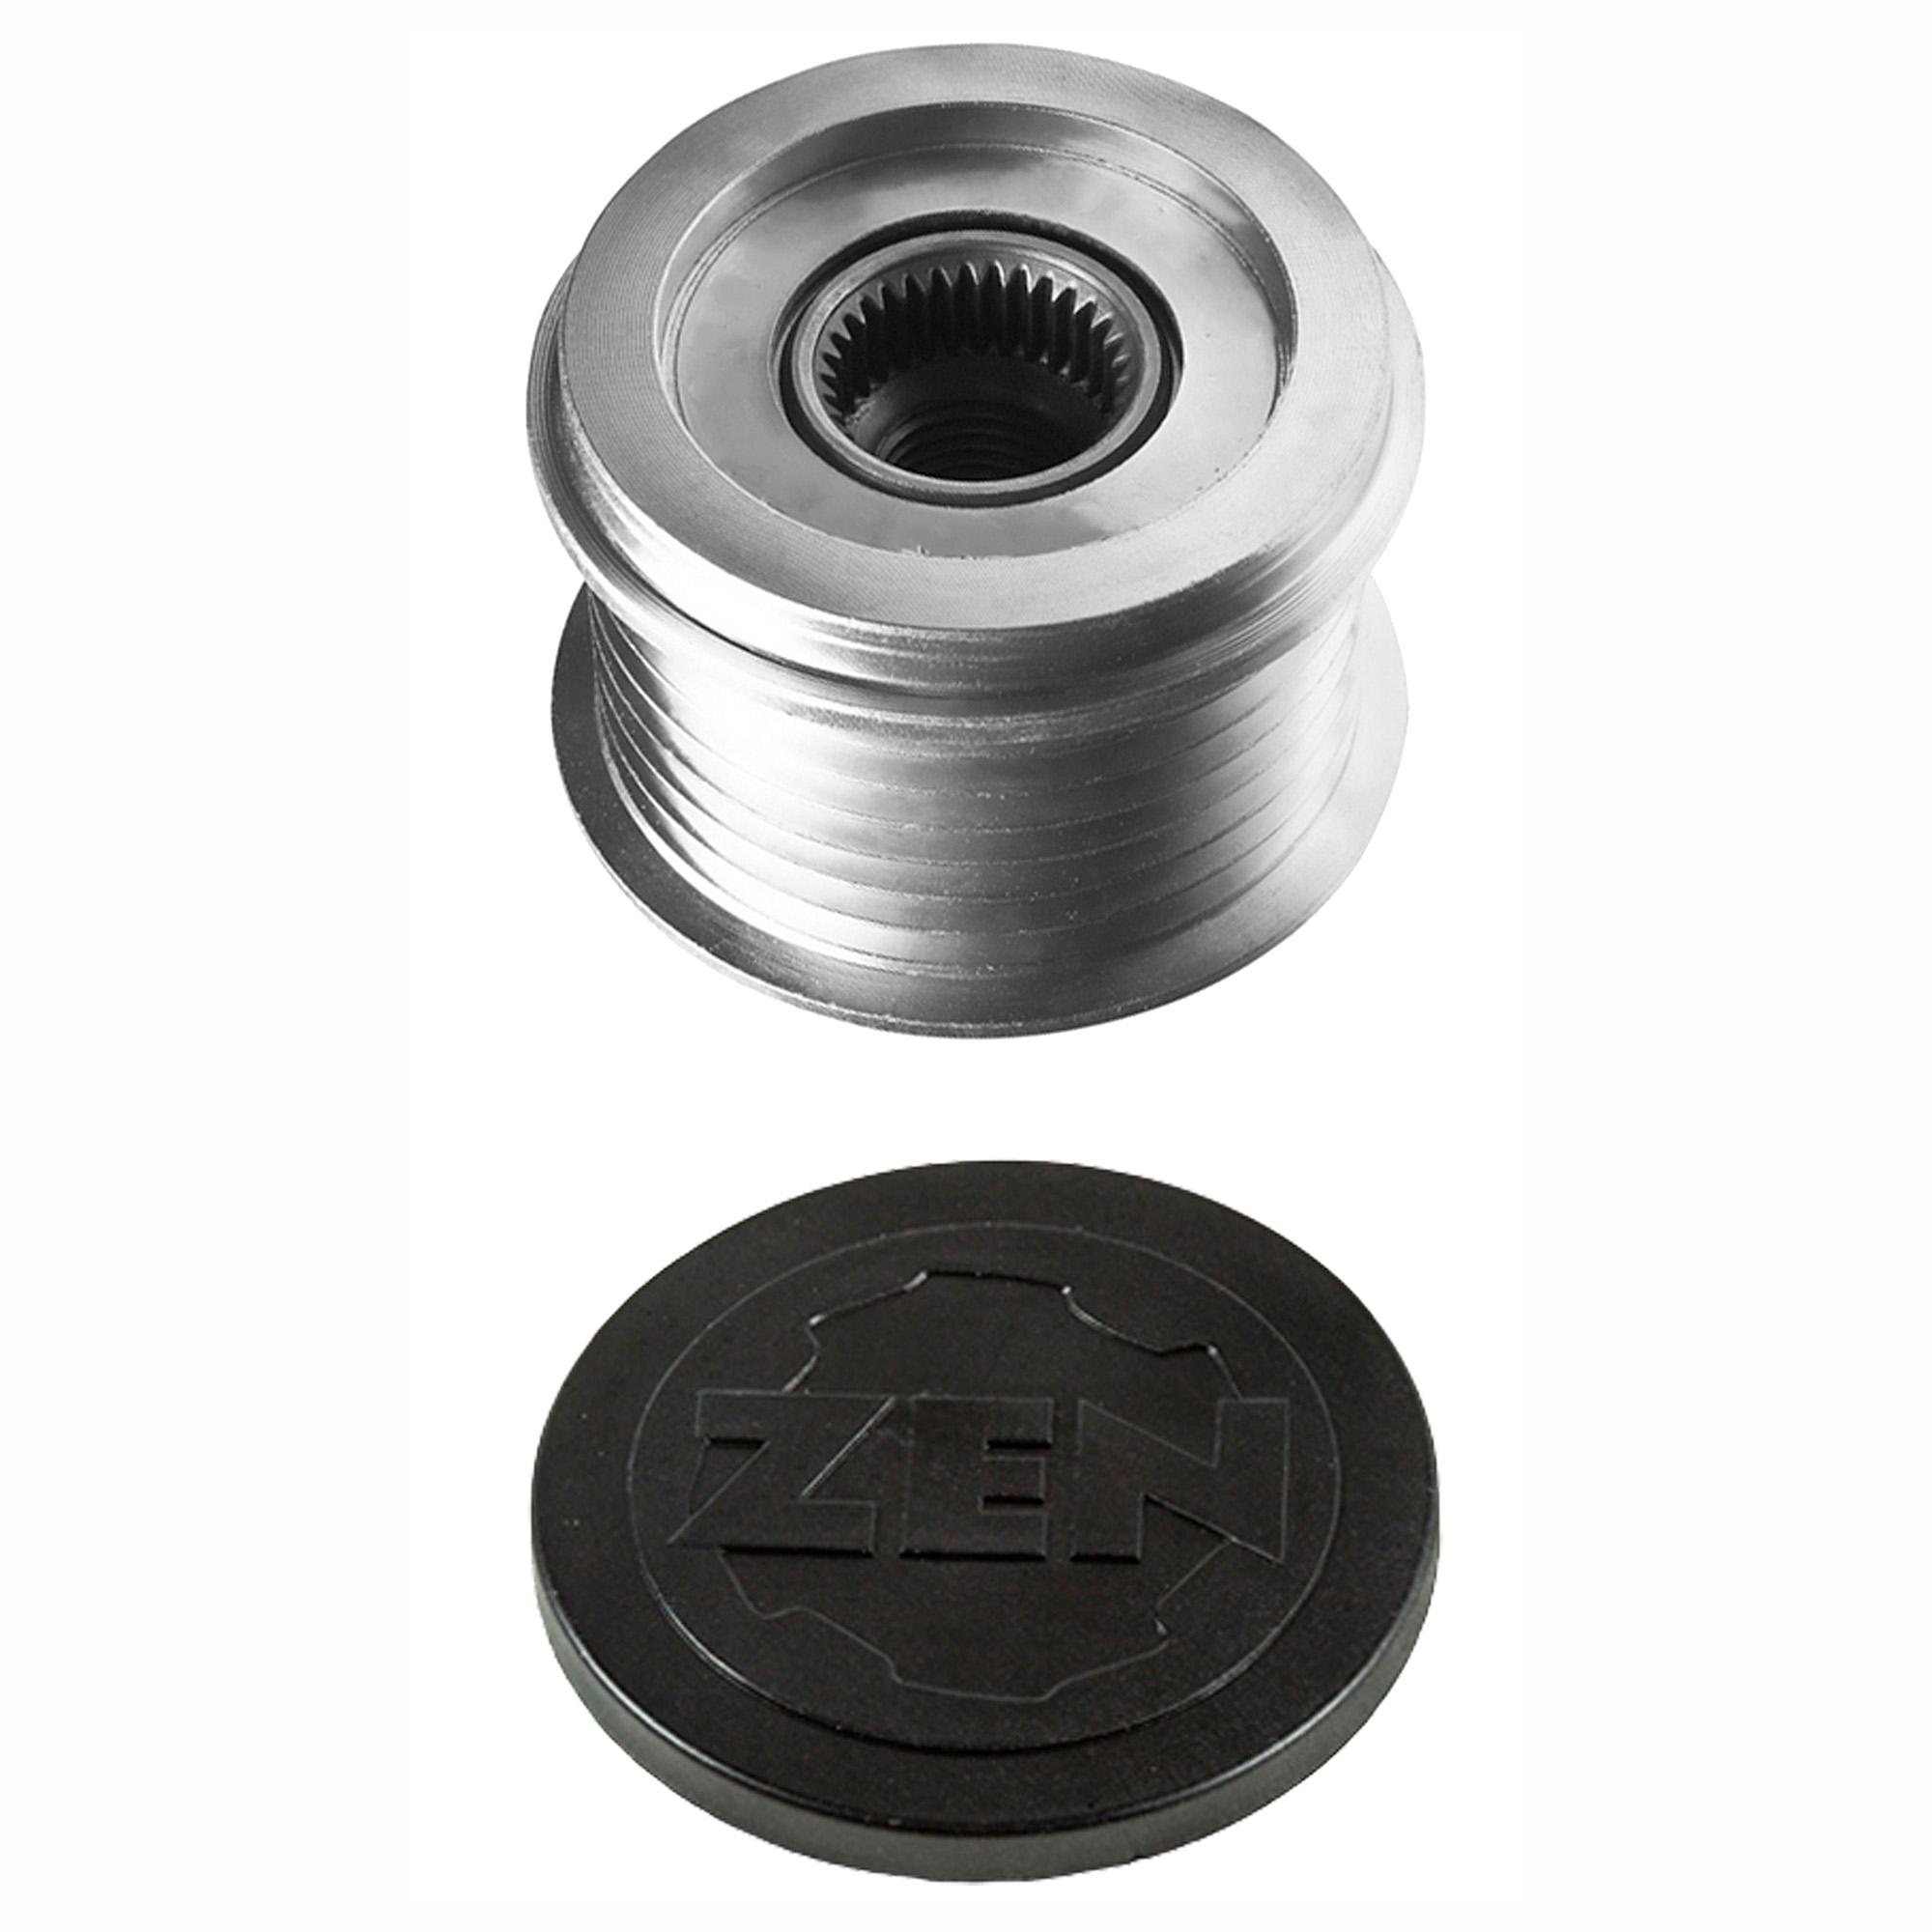 Polia Alternador Roda Livre CAMRY RVA LEXUS (ZEN5503) - ZEN